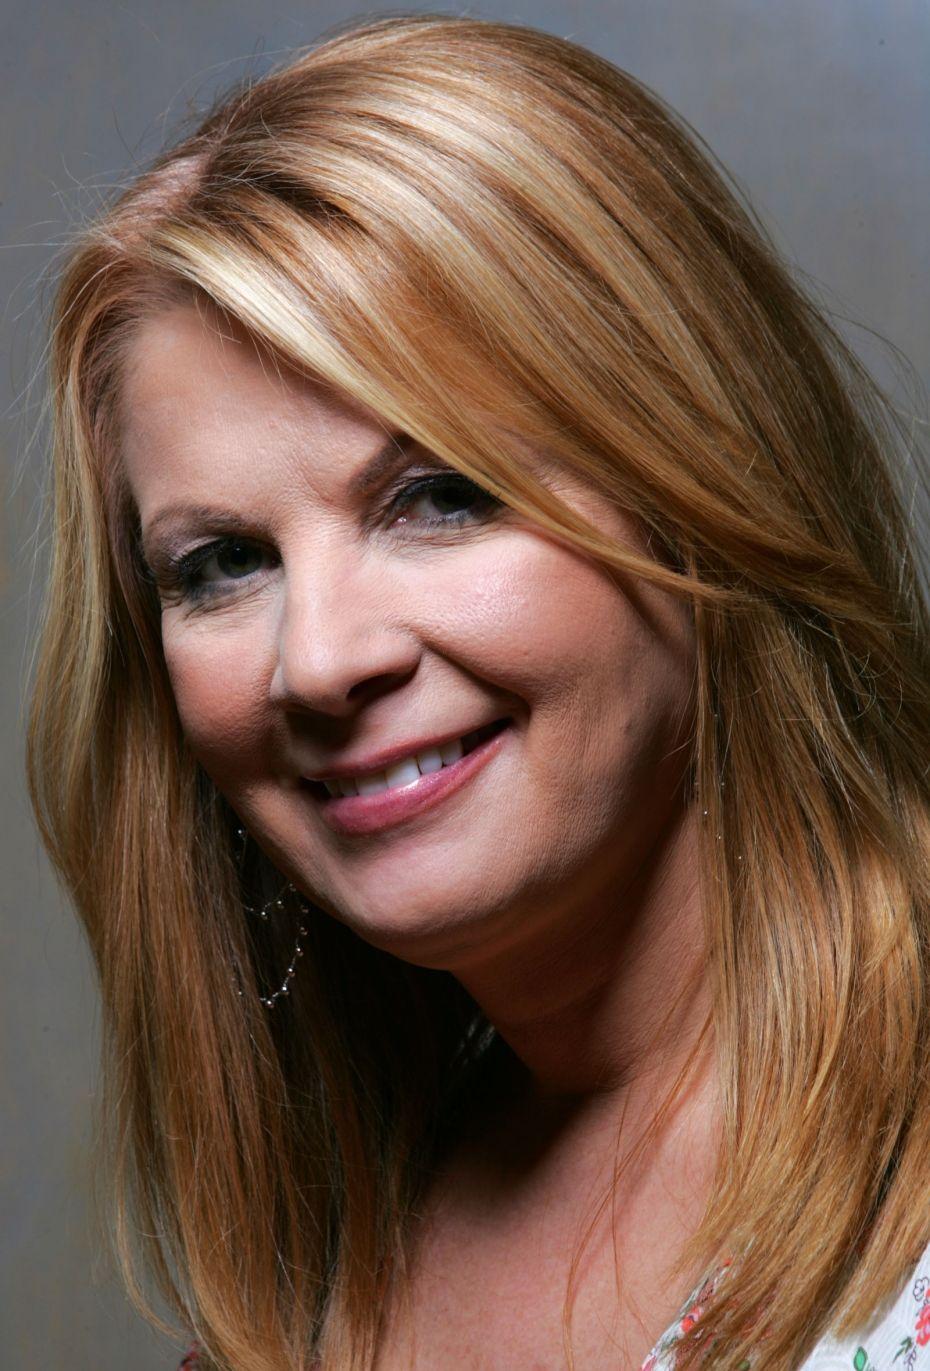 Patty Loveless (First cousin to sisters Loretta Lynn